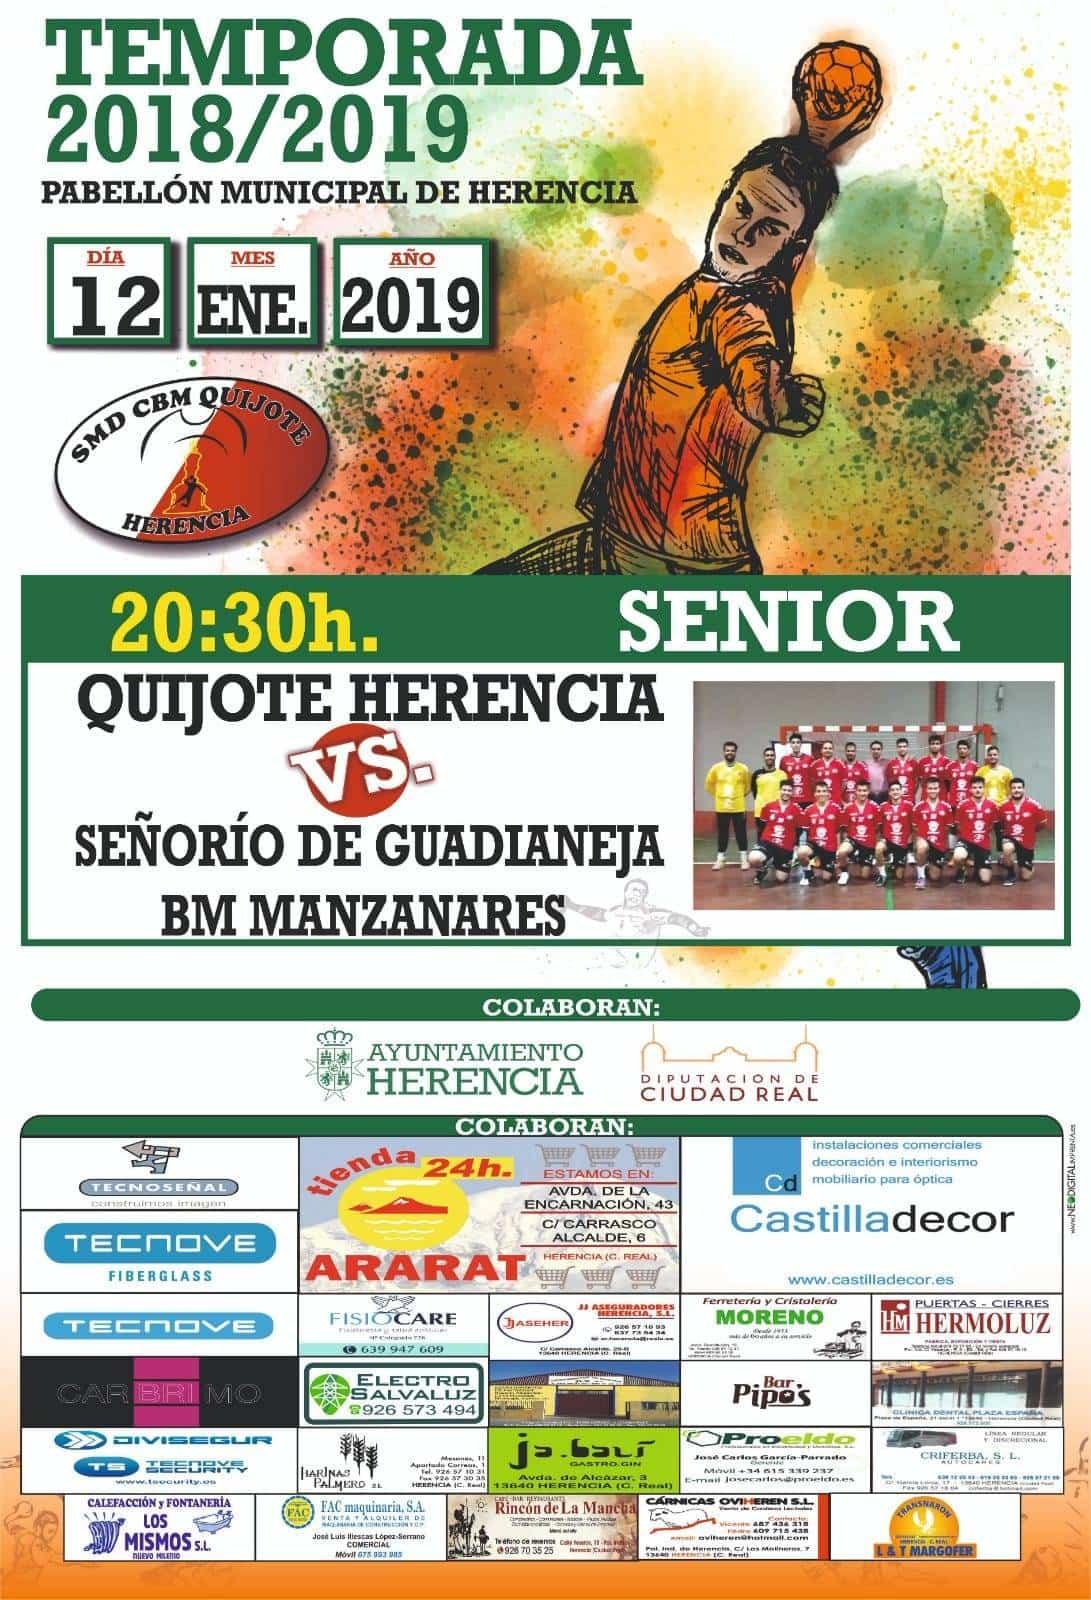 Quijote Herencia vs BM Manzanares